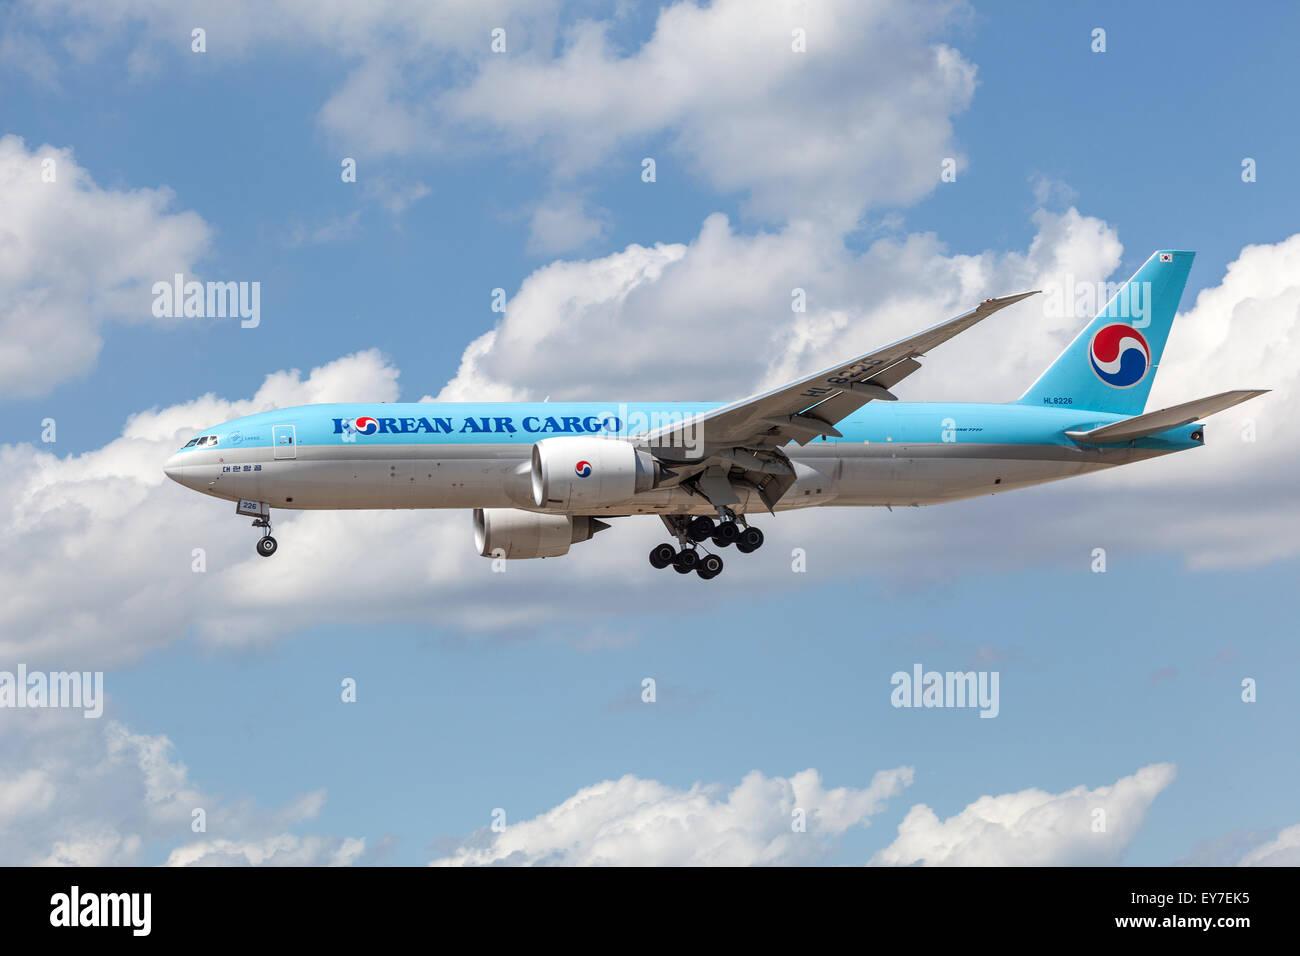 Korean Air Cargo Boeing 777F landing at the Frankfurt International Airport - Stock Image